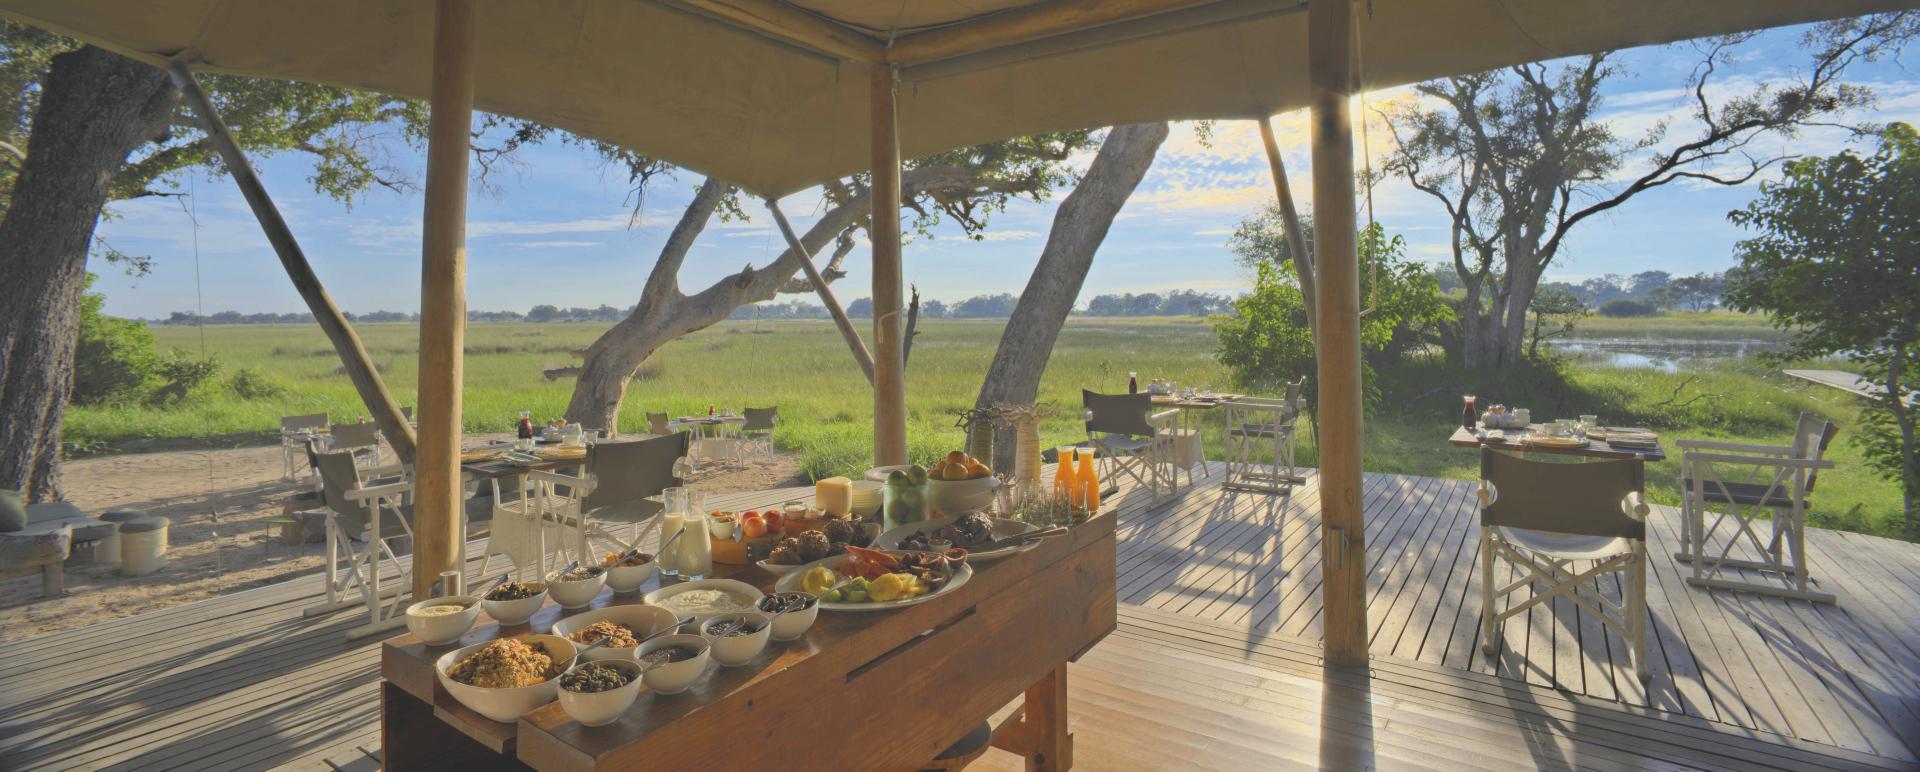 andBeyond Xaranna Okavango Delta Camp Lounge